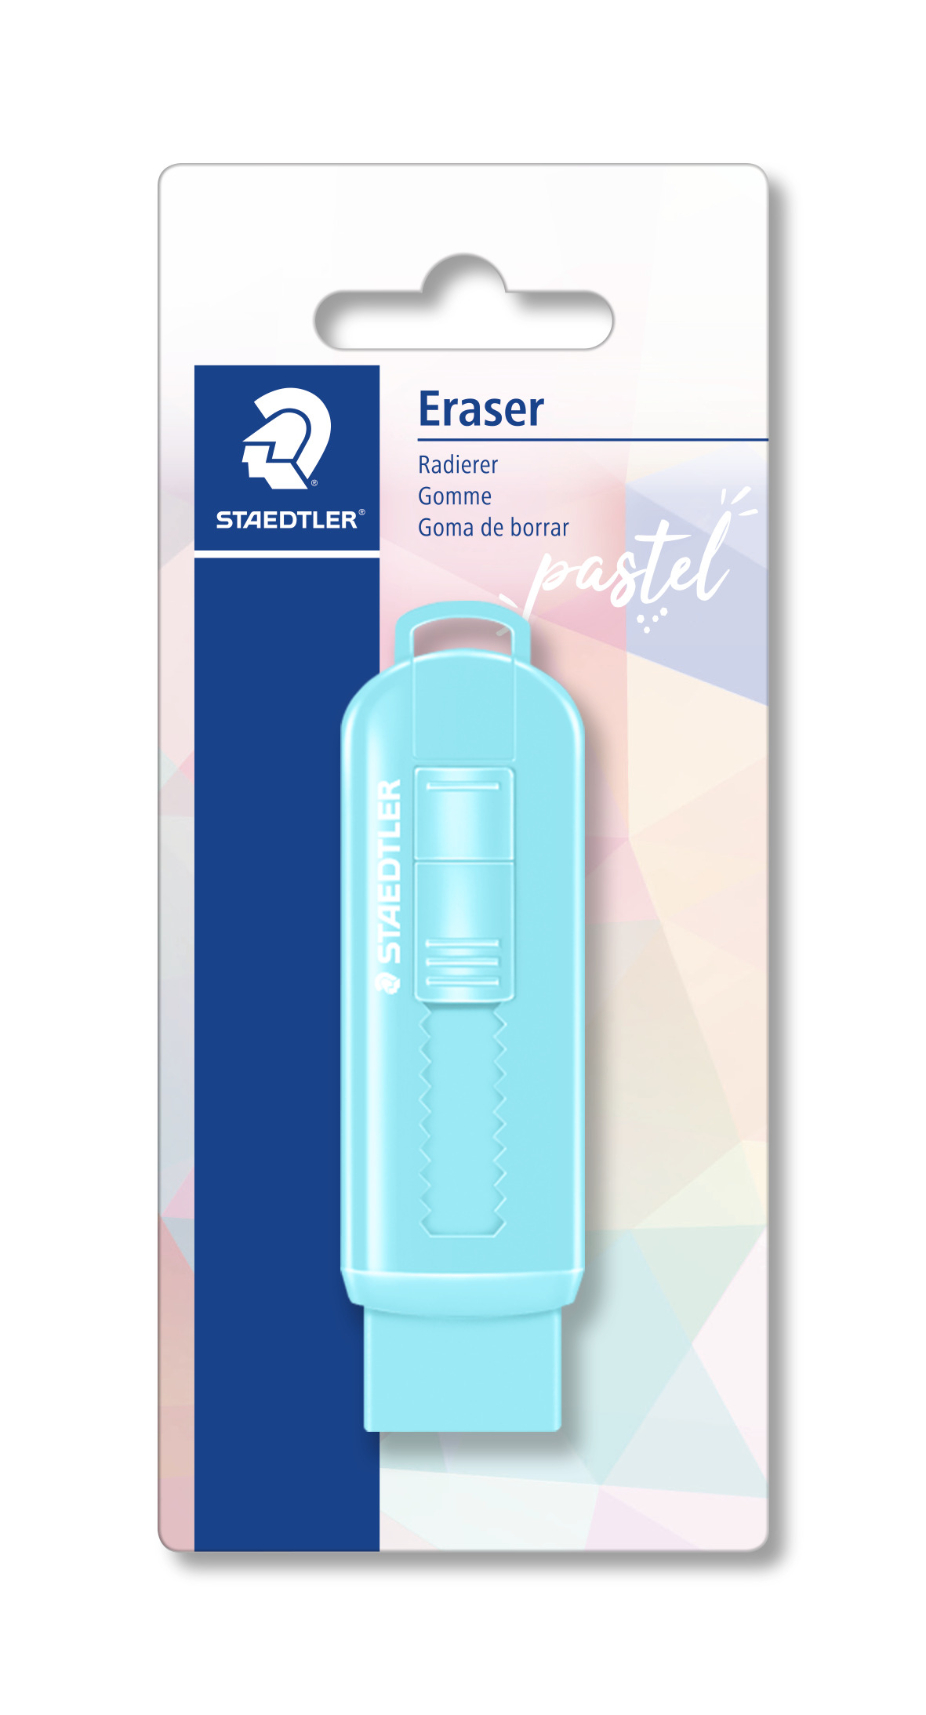 Borracha sem PVC com capa plástica 525 PS - STAEDTLER